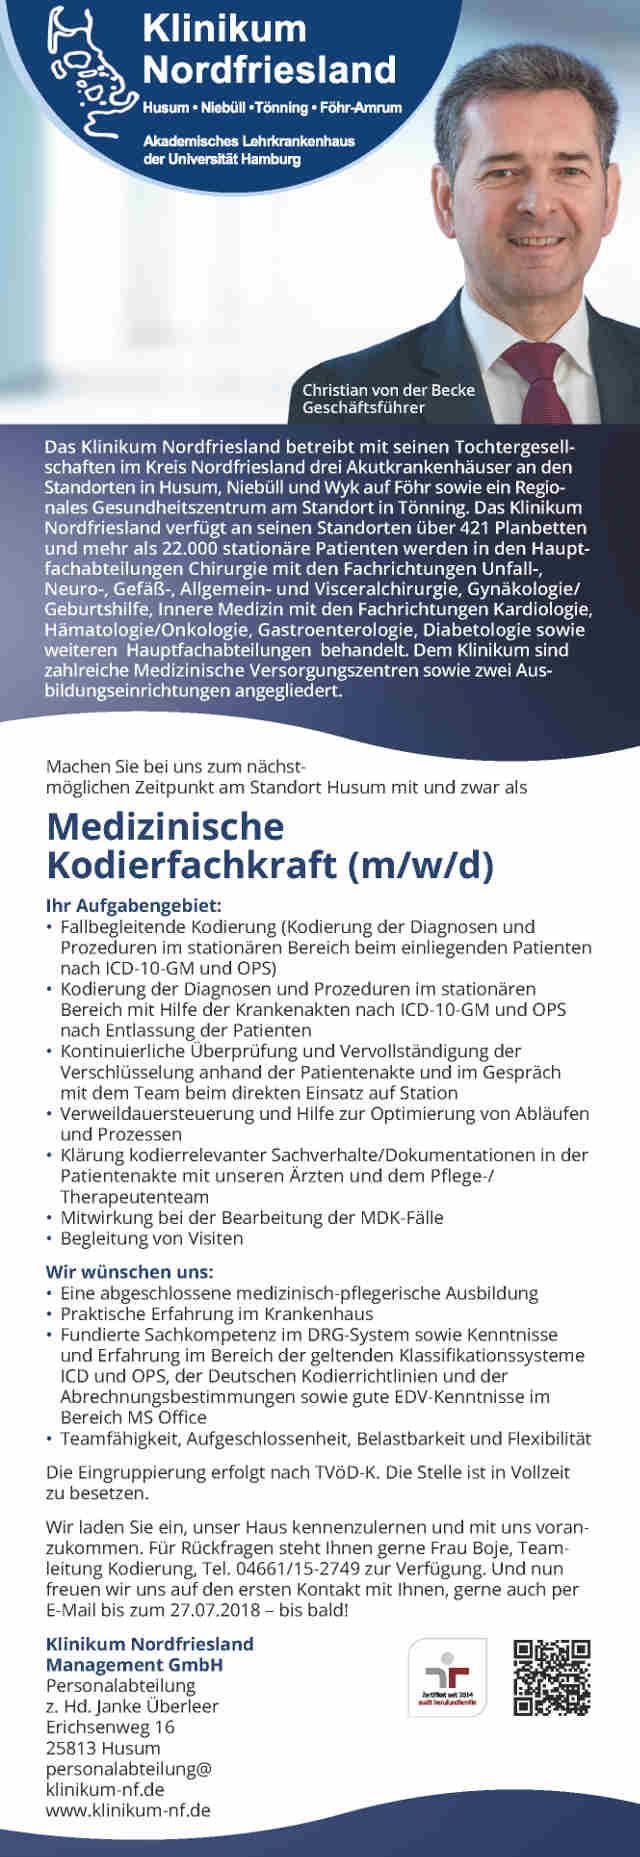 Klinikum Nordfriesland, Husum: Medizinische Kodierfachkraft (m/w/d)